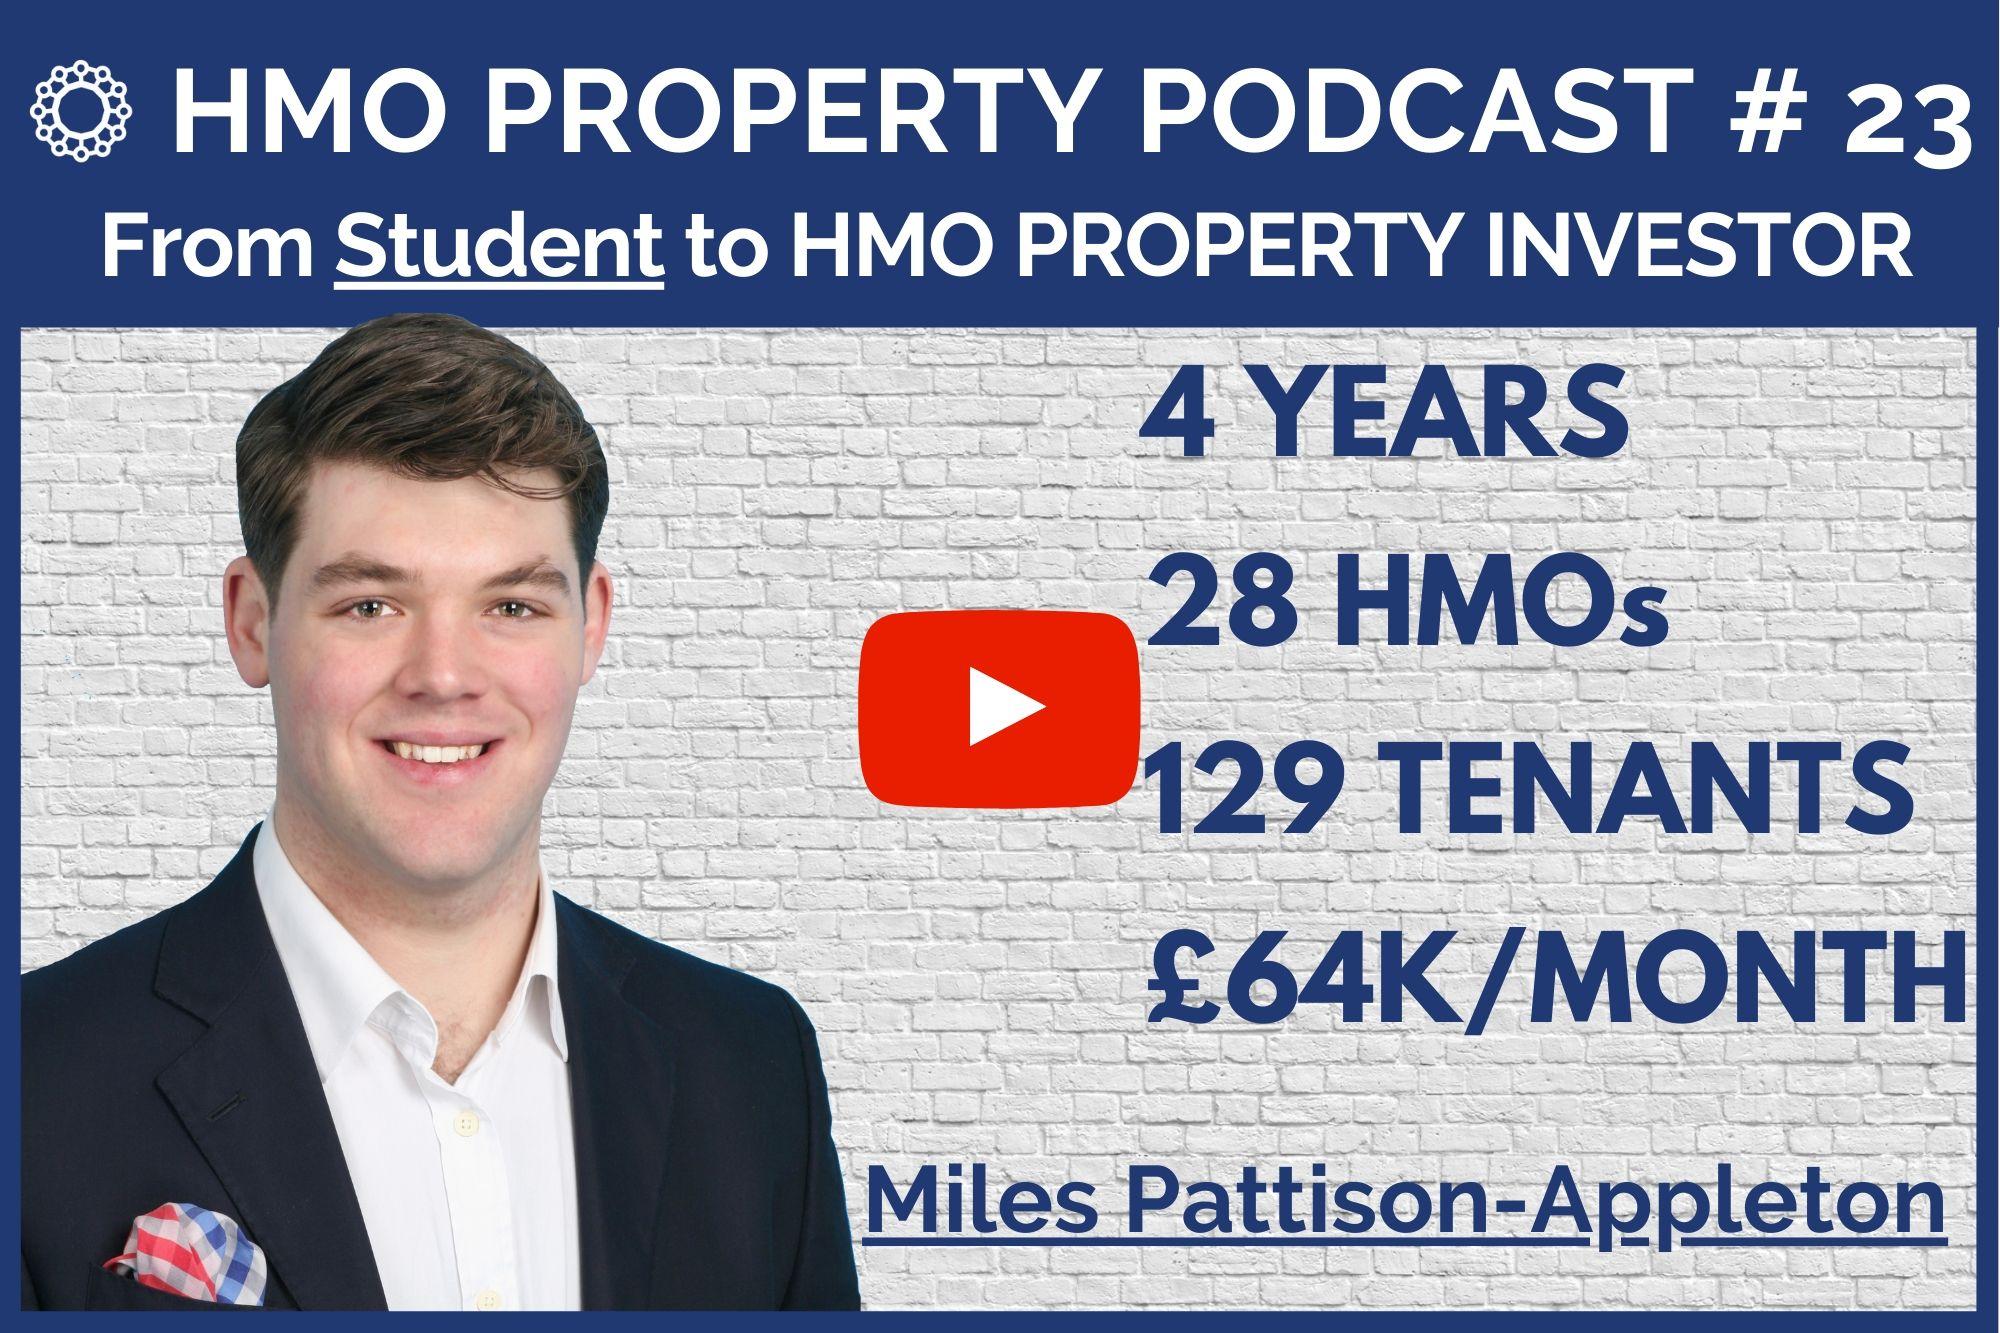 HMO Property Podcast with Miles Pattison-Appleton